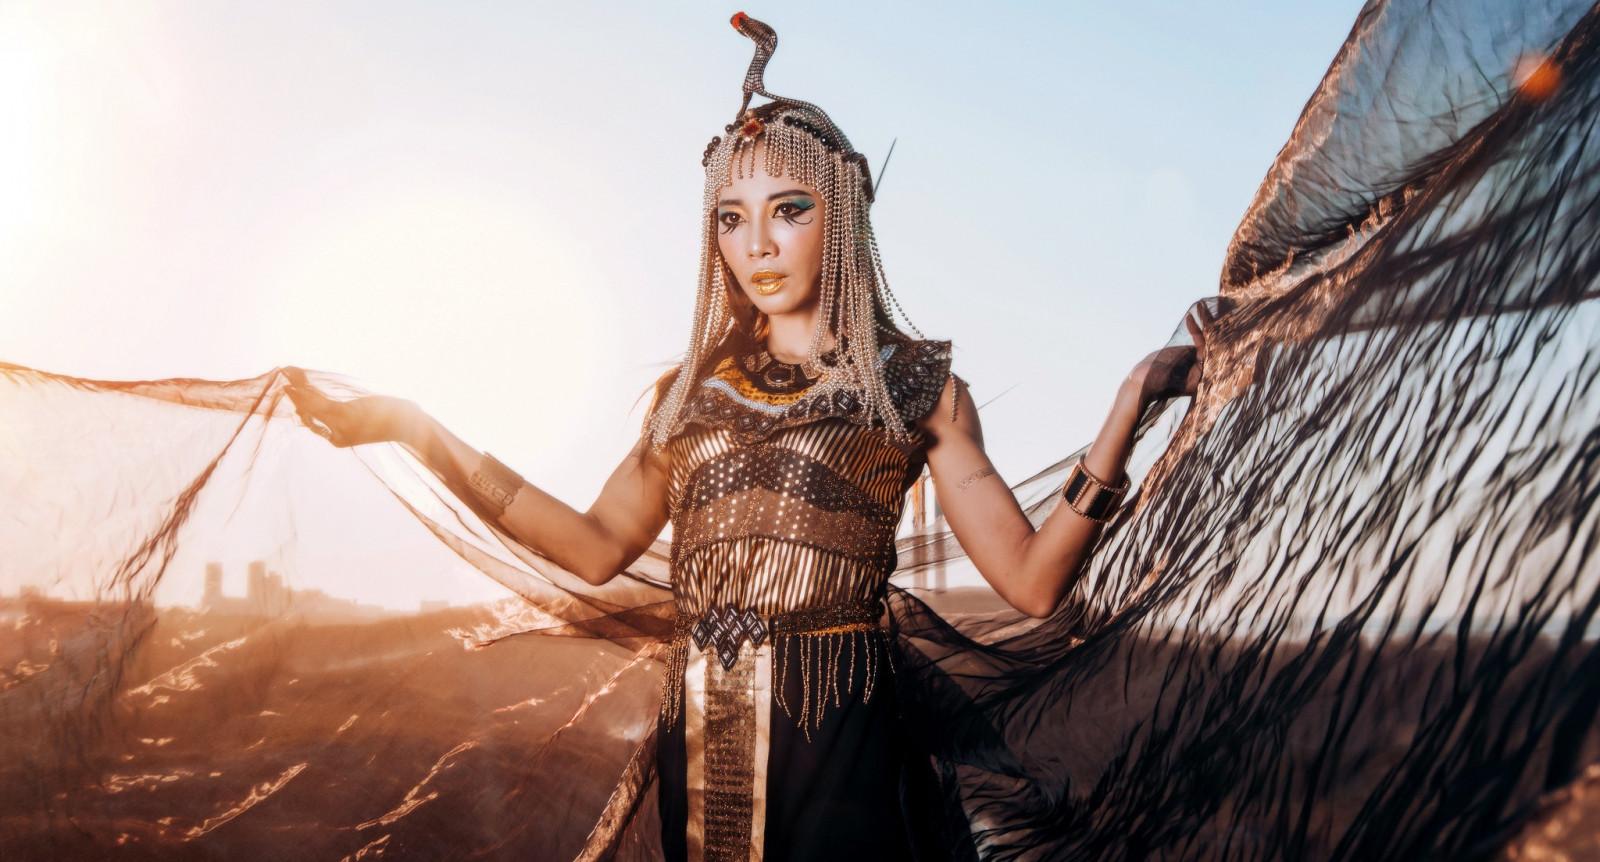 того, фотомодели девушки египтянки трубочки